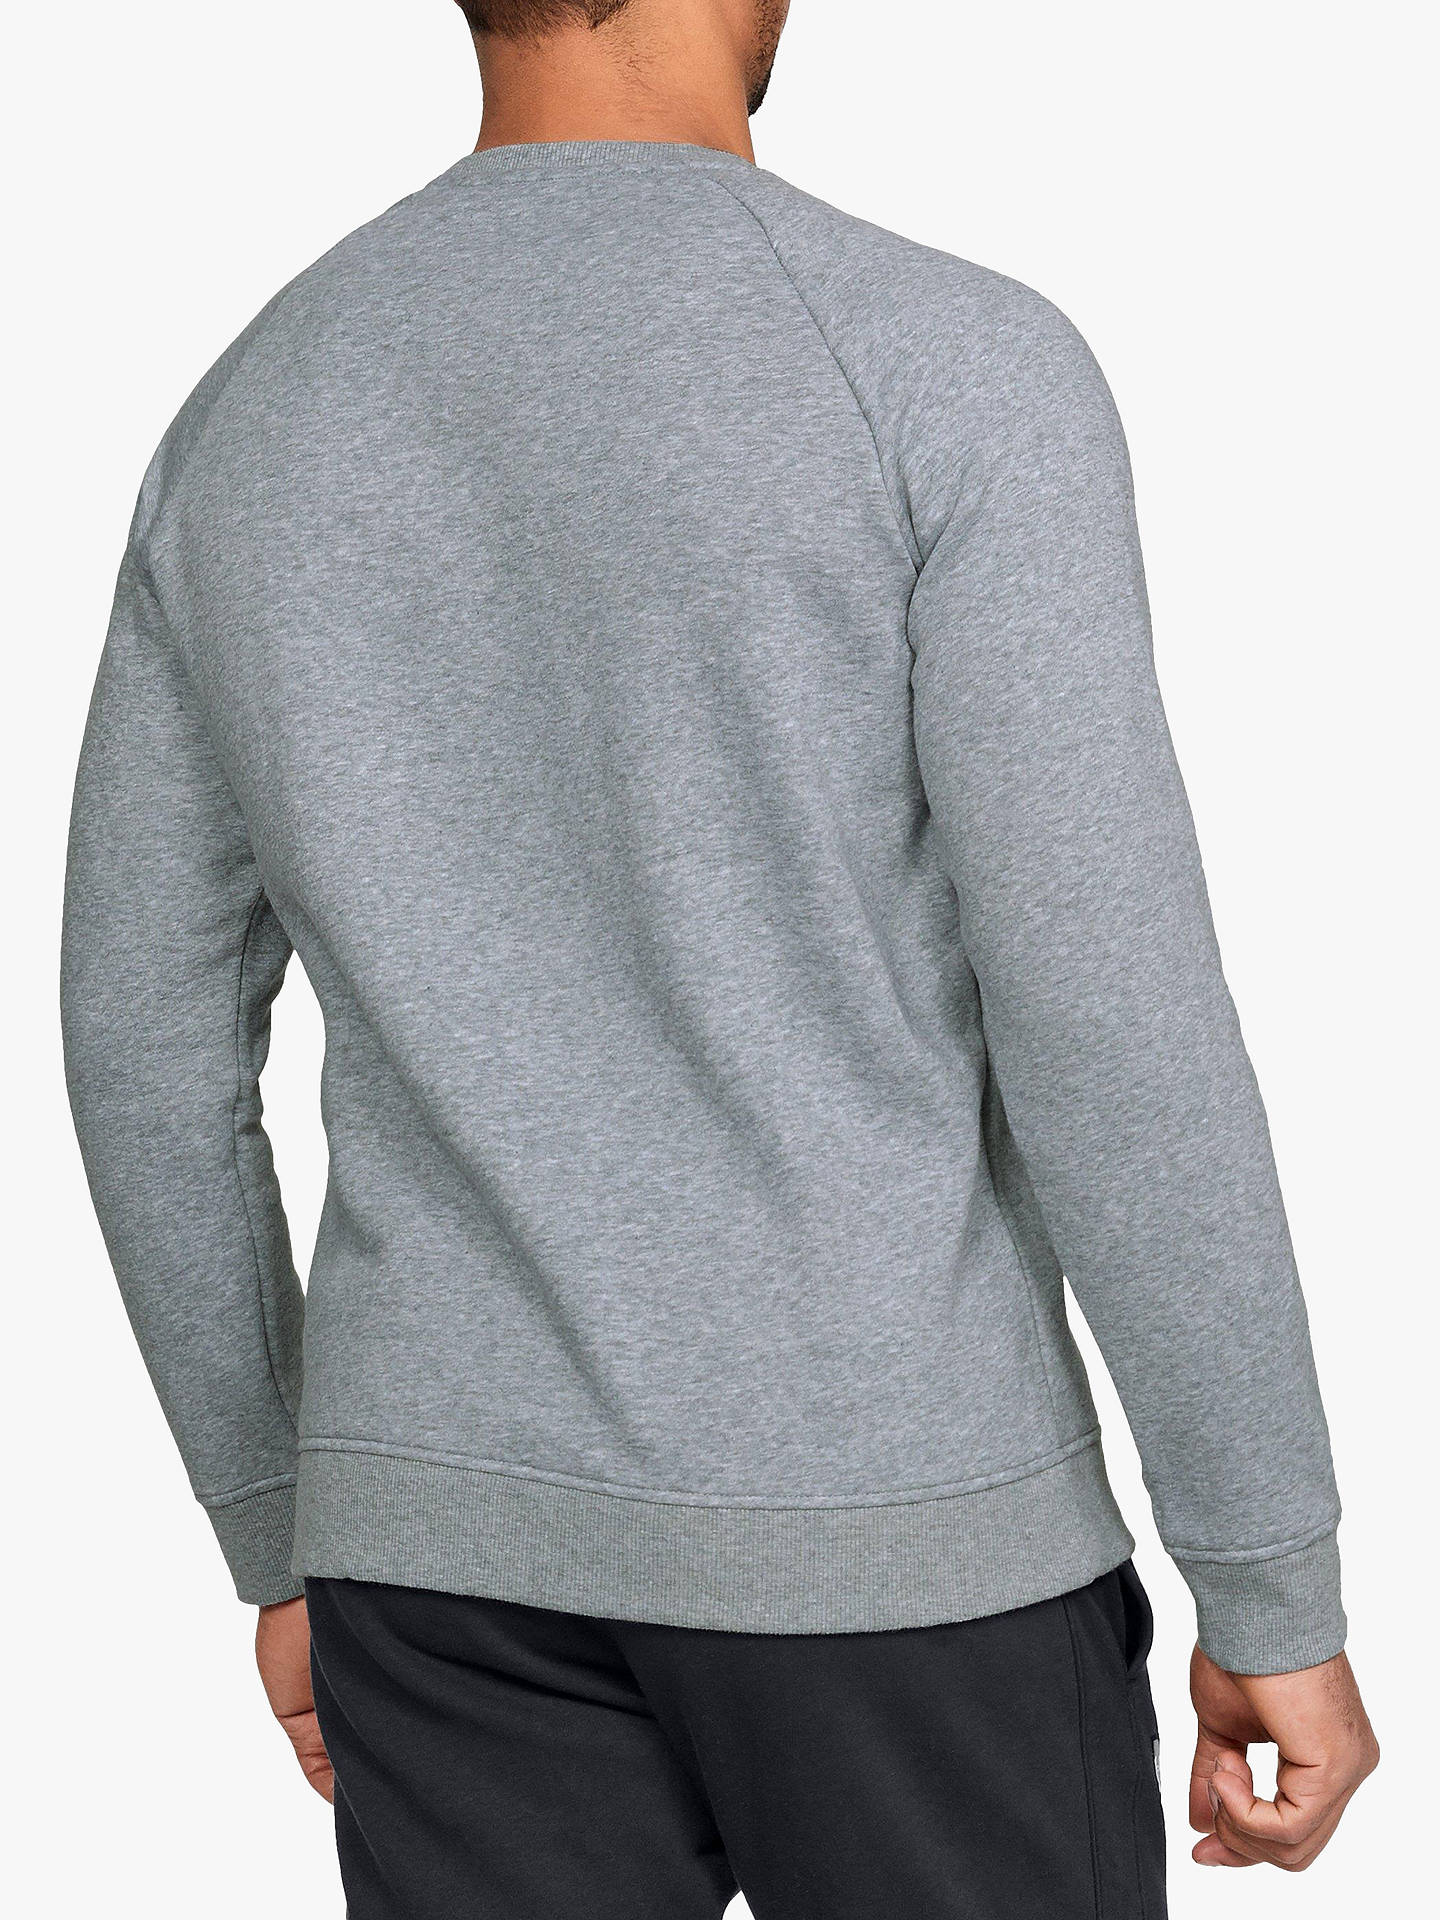 b173f0a941 Under Armour Rival Fleece Crew Neck Sweatshirt, Steel/Black